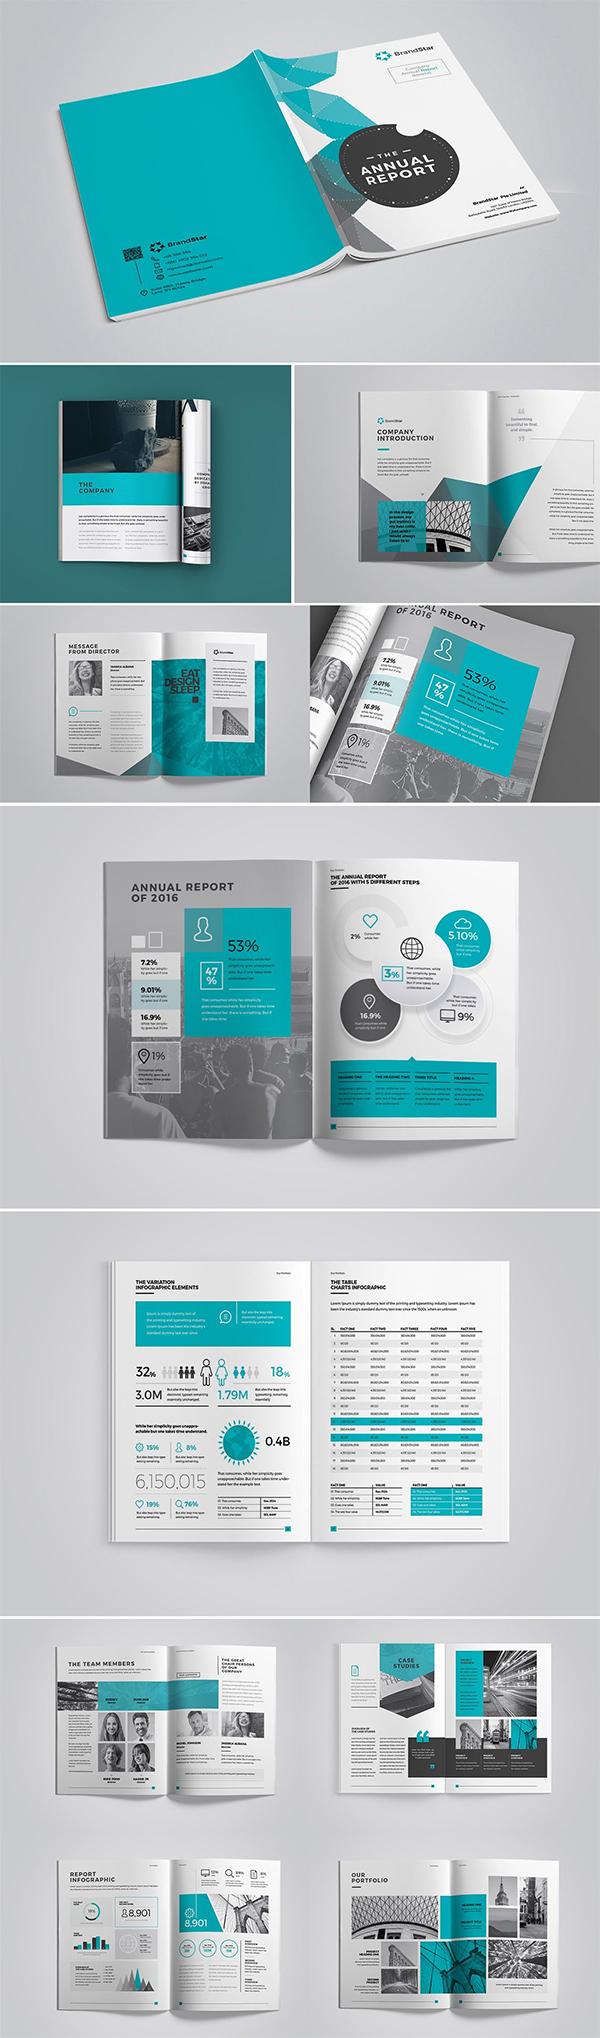 Annual Report Brochure